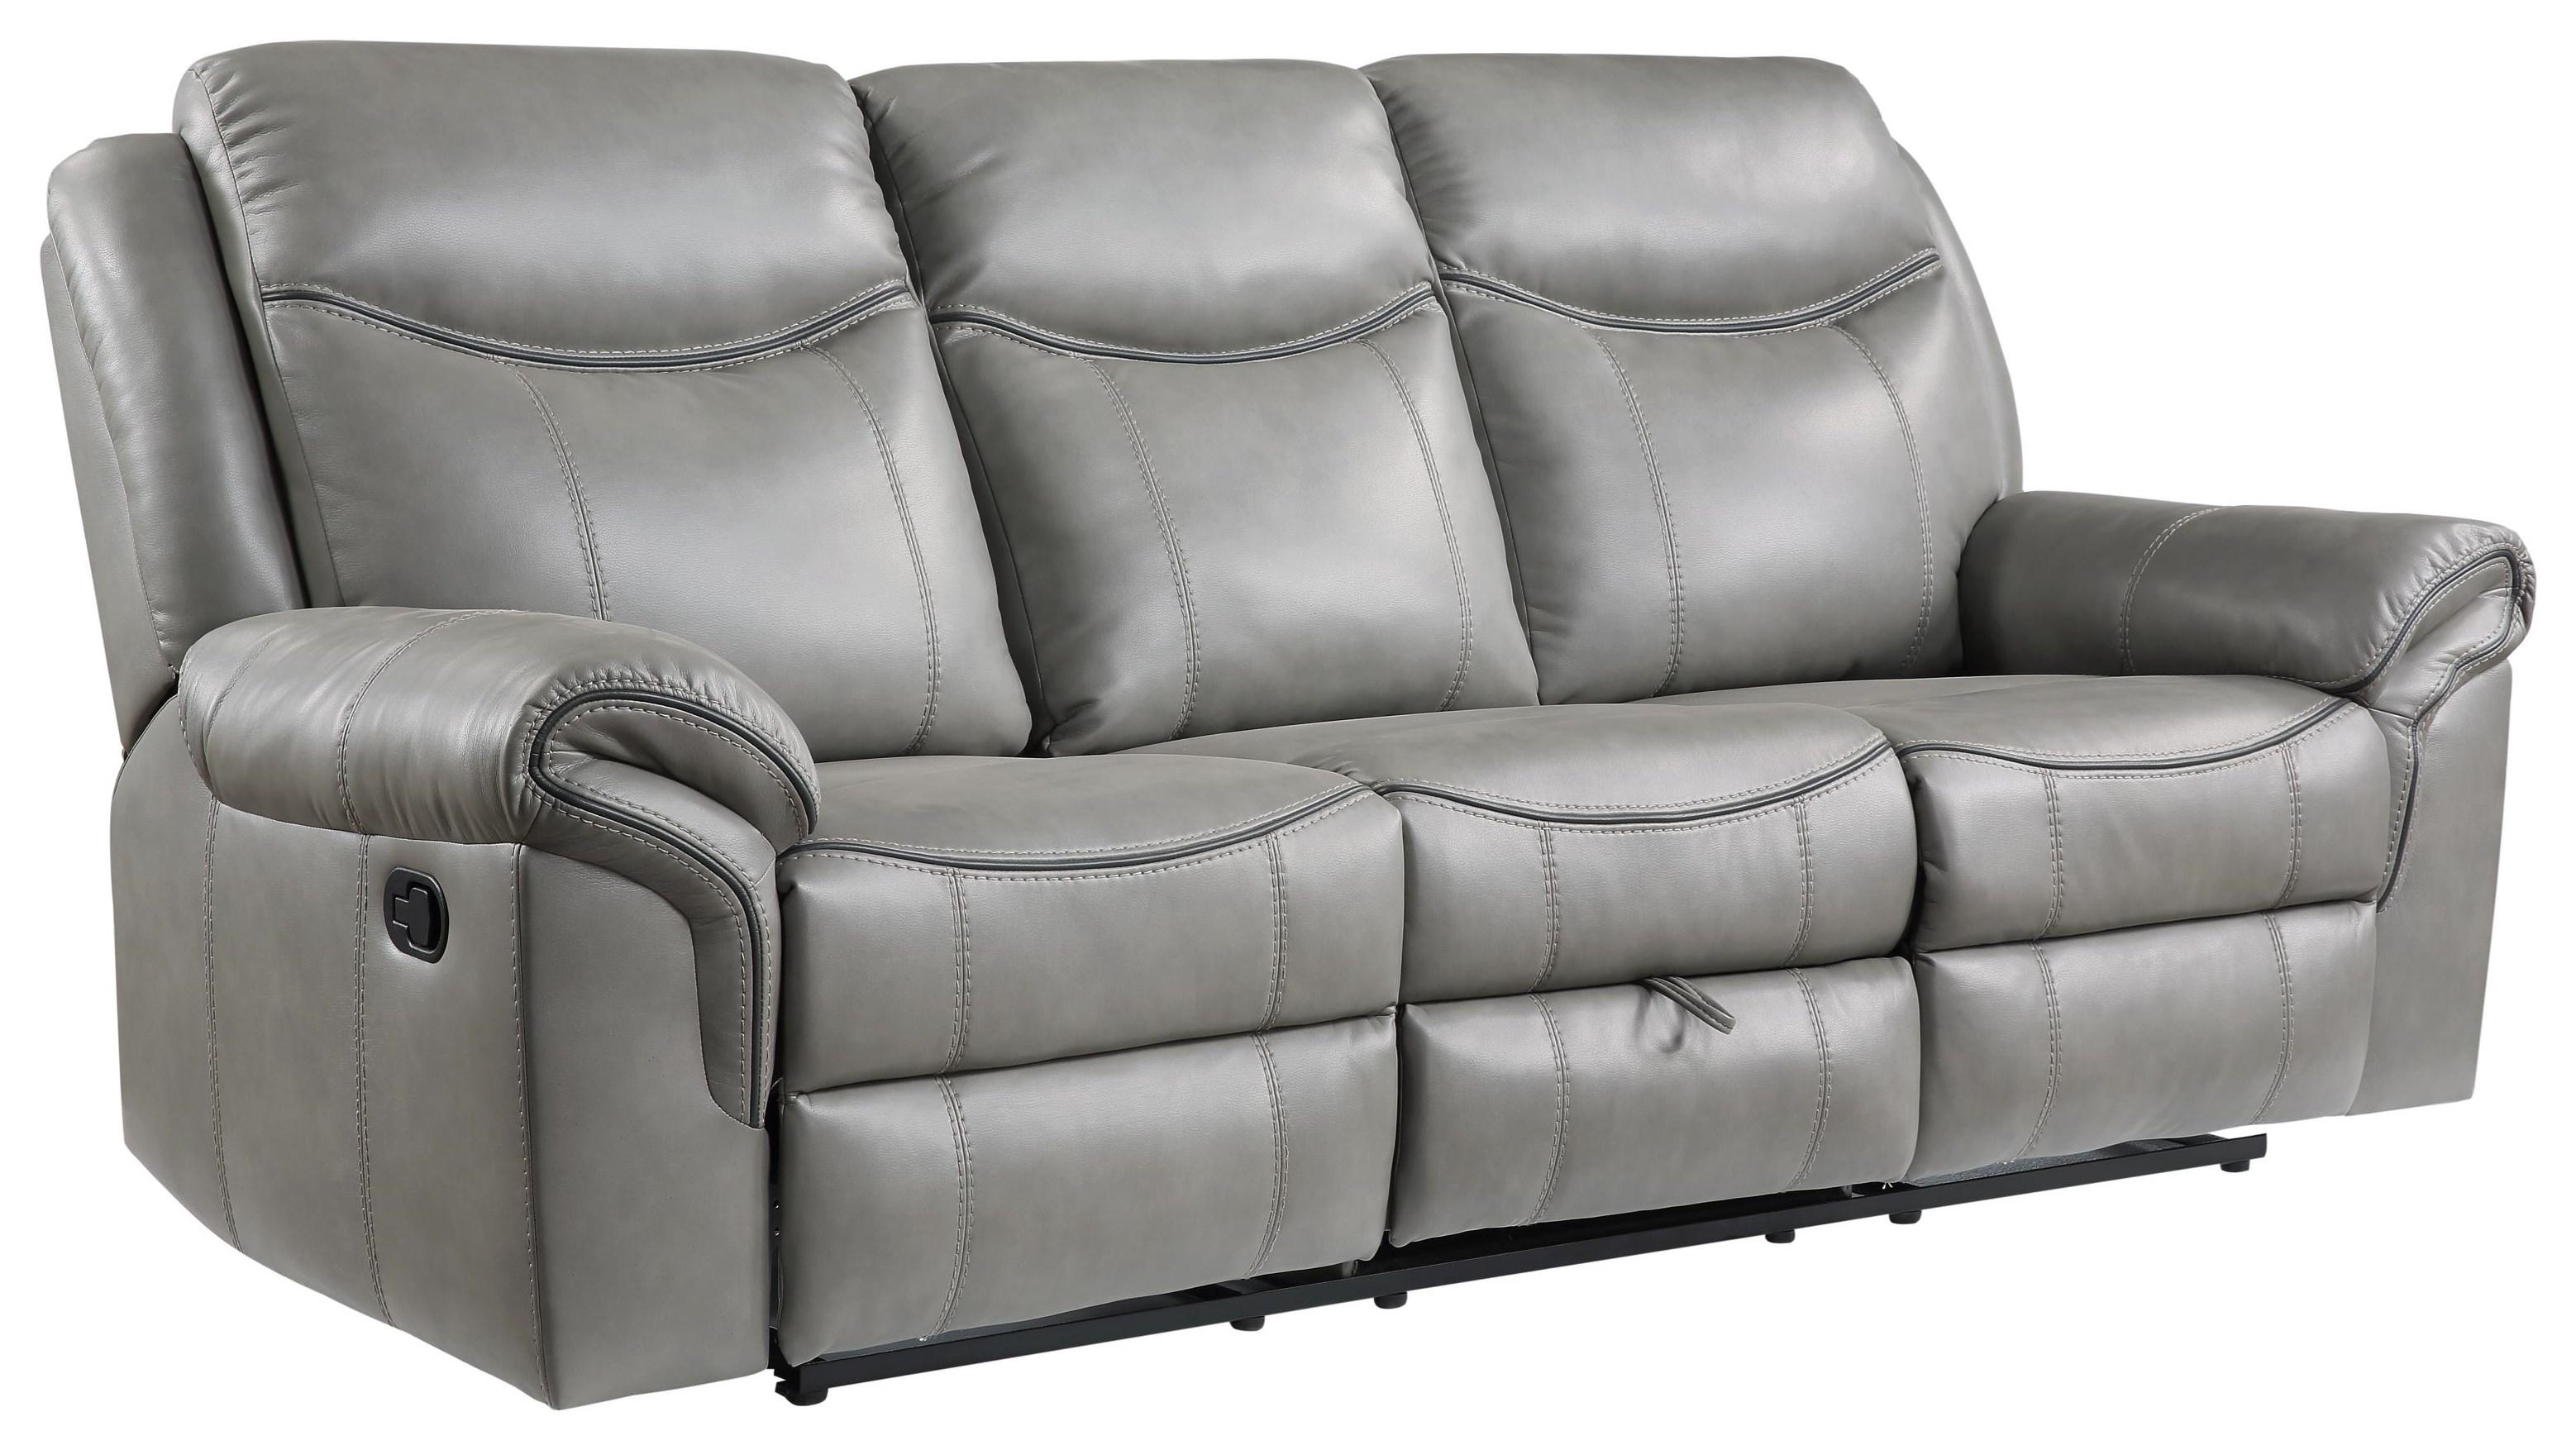 Aram Dual Reclining Sofa by Homelegance at Darvin Furniture